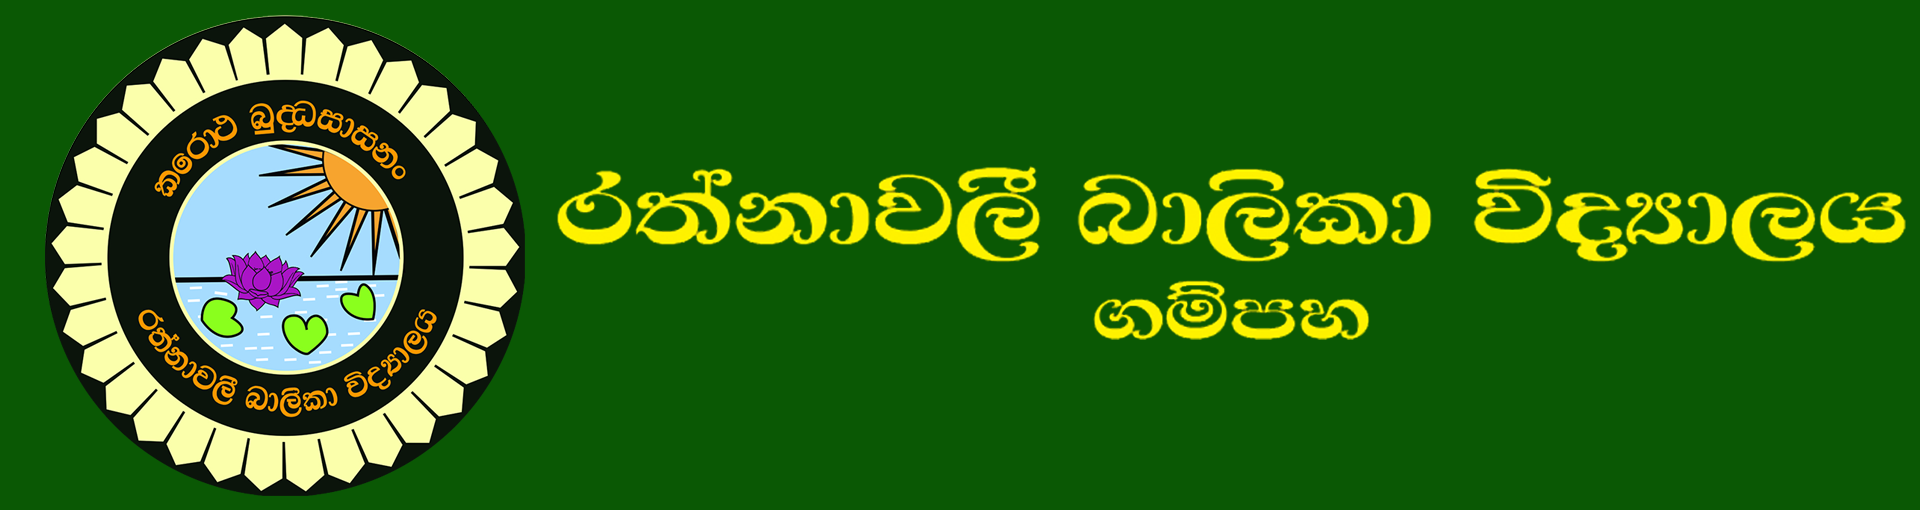 Rathnavali Balika Vidyalaya